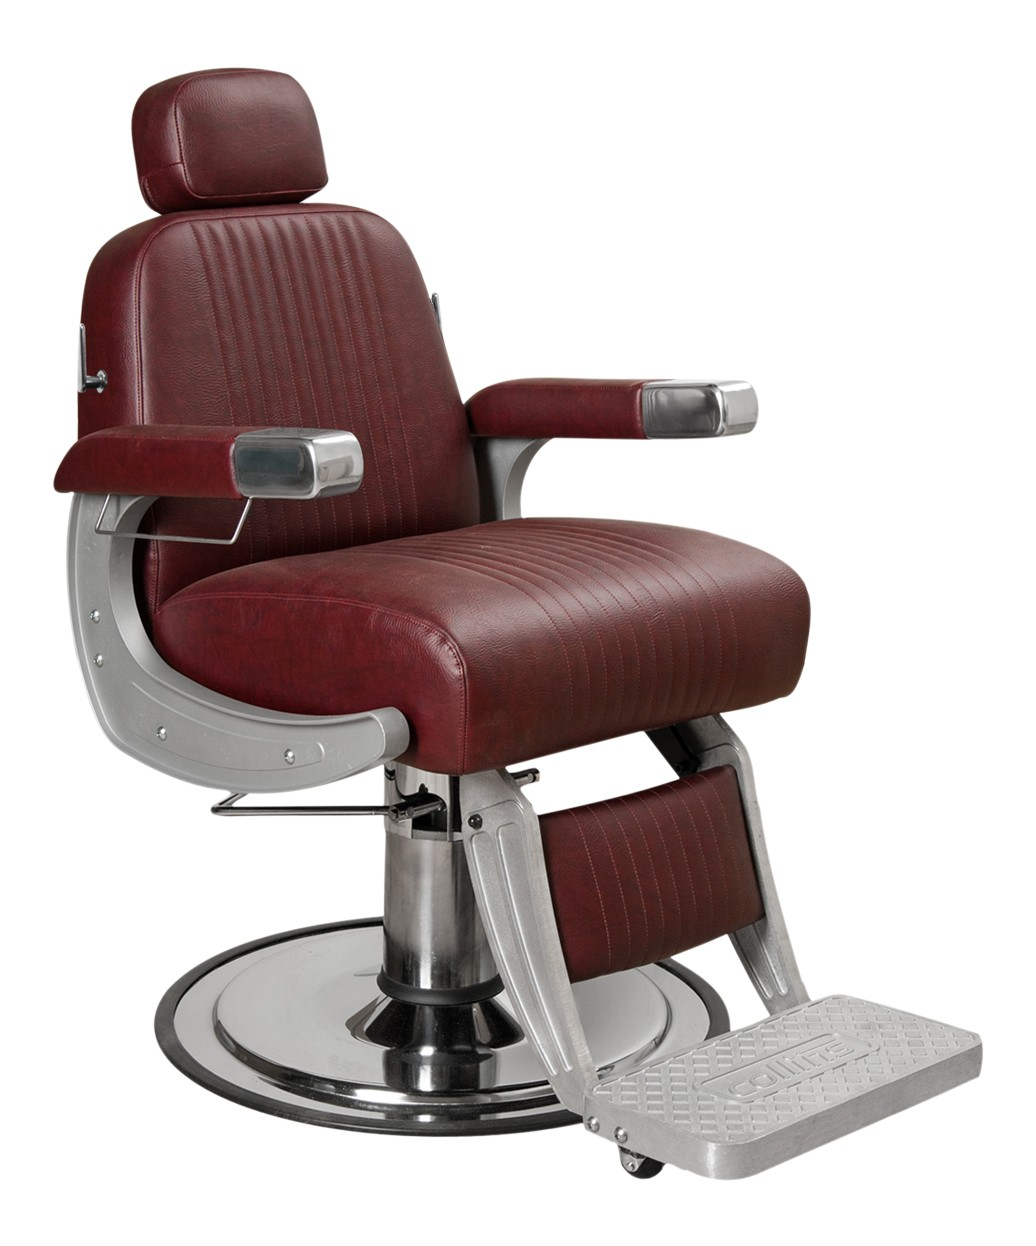 B70 Cobalt Omega Barber Chair